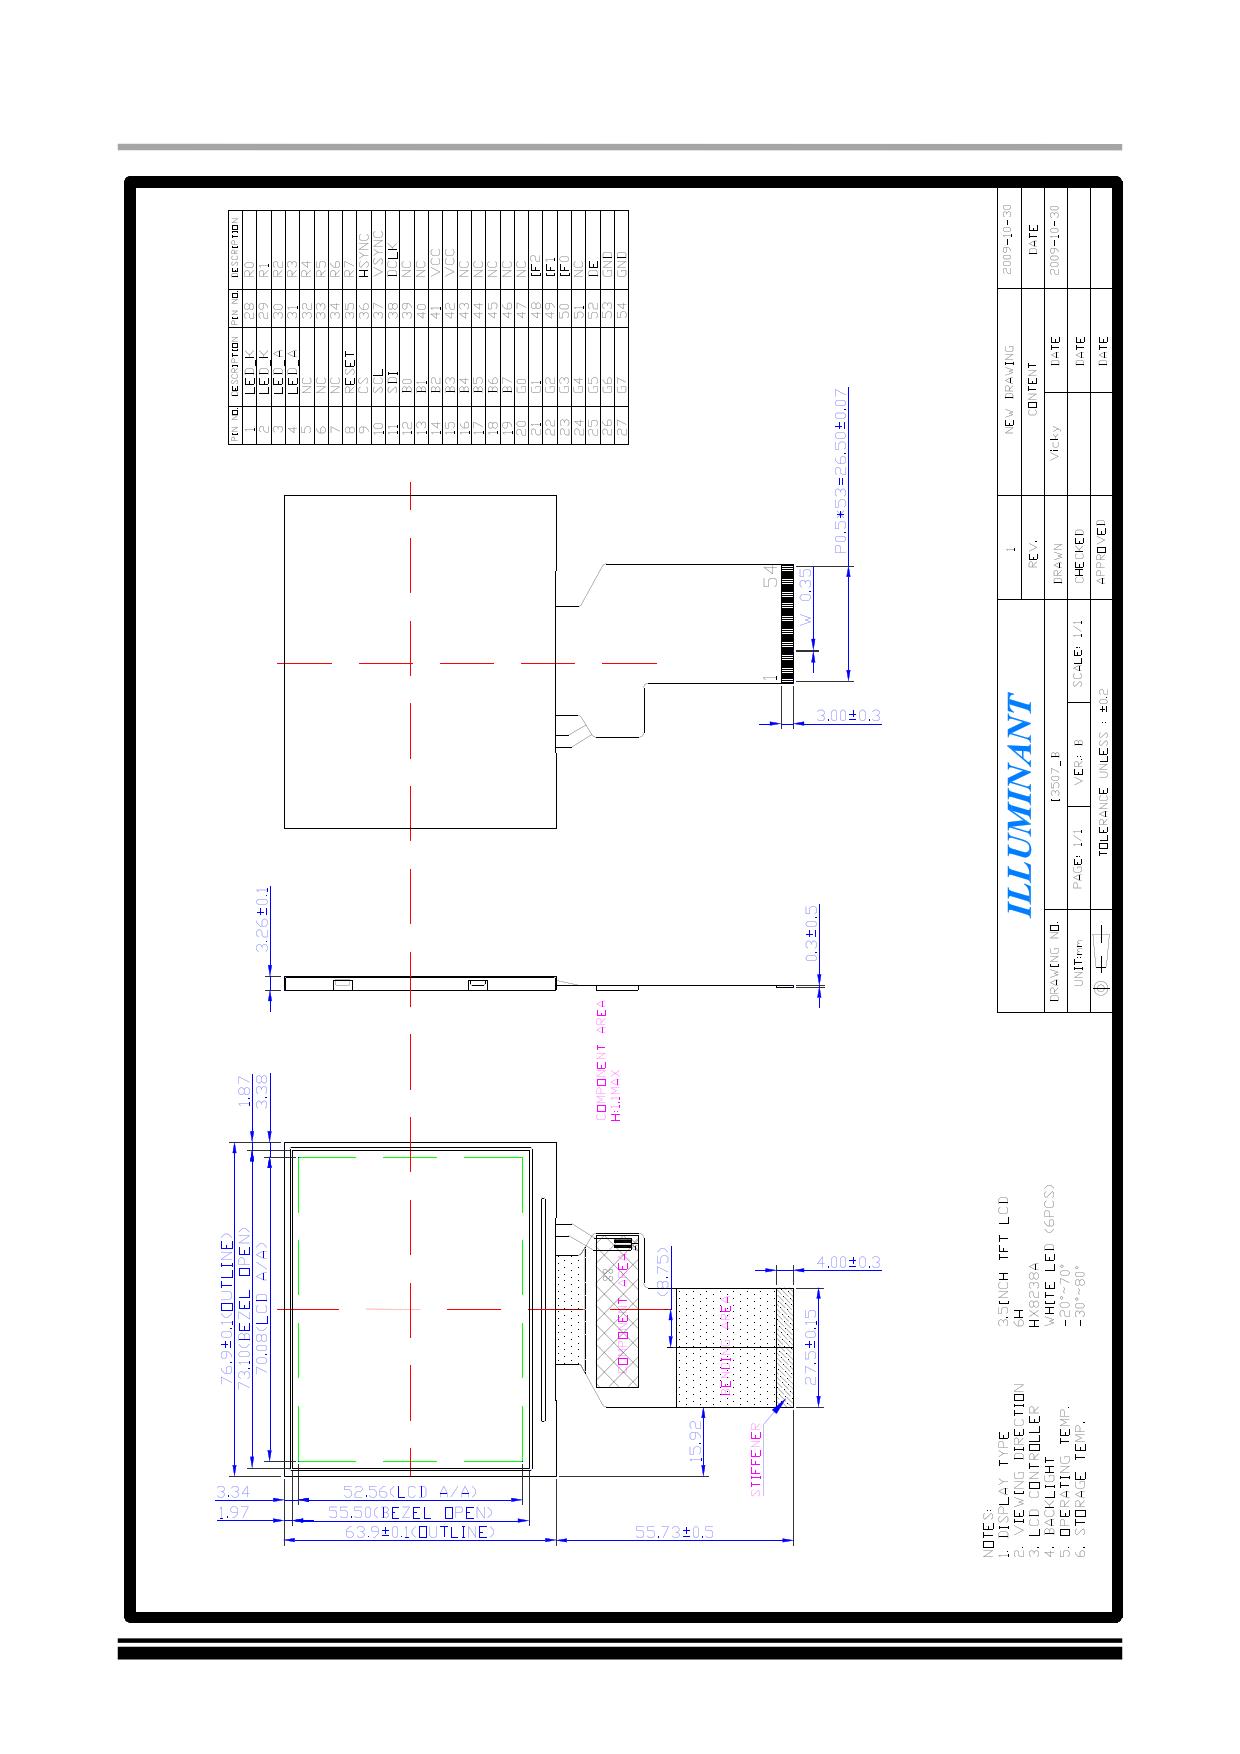 I3507-6HMN3224B pdf